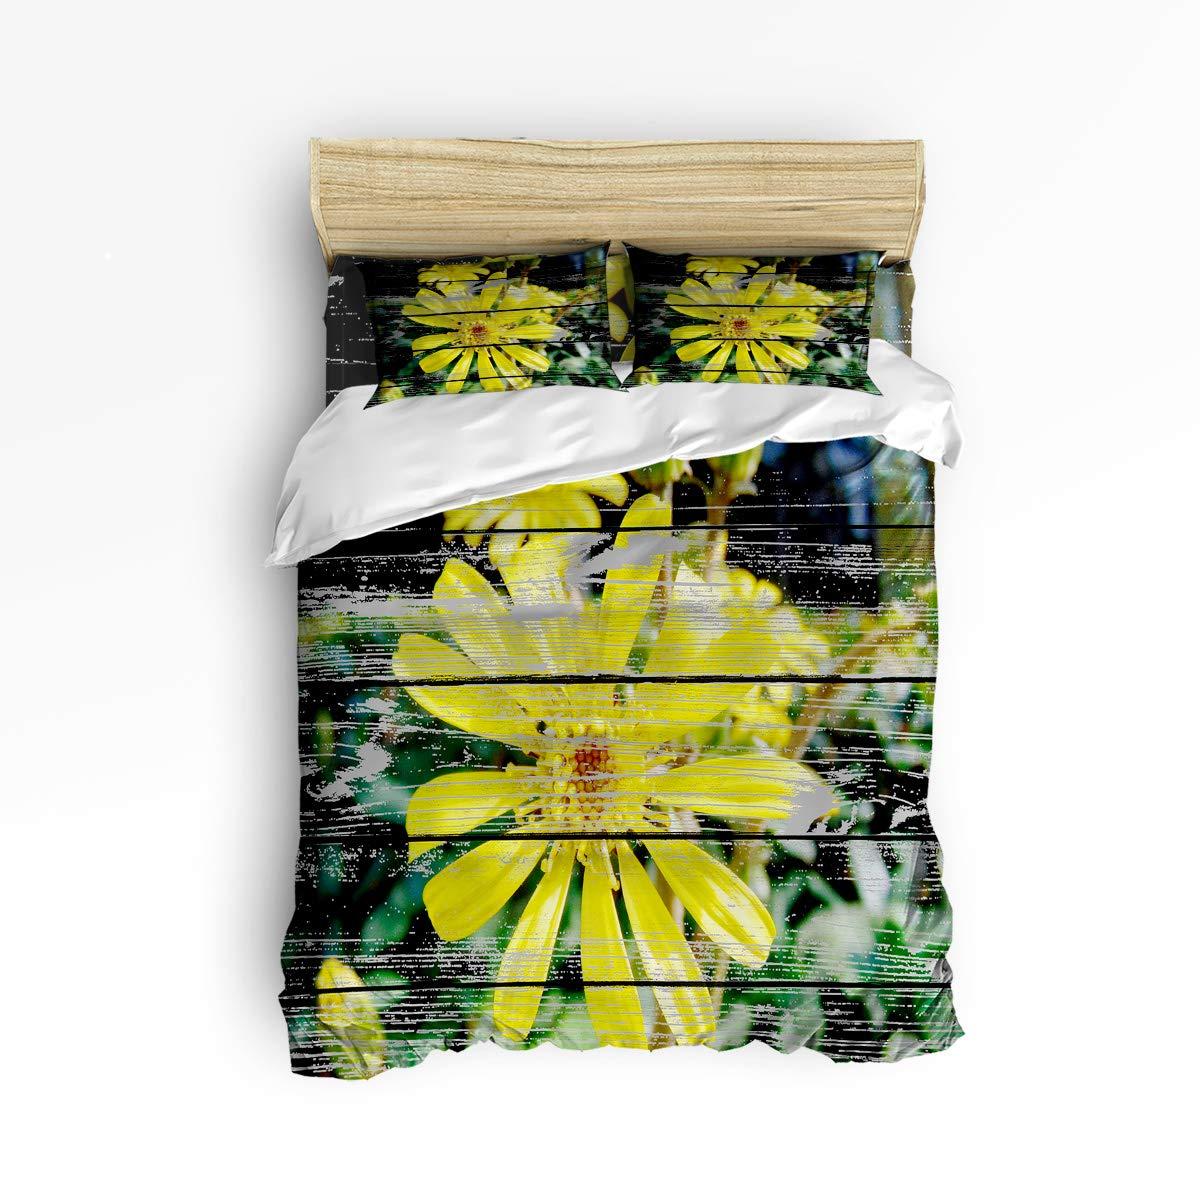 YEHO アートギャラリー 掛け布団カバーセット キュートな寝具セット 女の子 男の子 サンセットの美しさのきっかけ ココナッツ大人ベッドセット 4点 フラットシート1枚、布団カバー1枚、枕カバー2枚 キング 20181119WHLSJTYAGYASSTW01526SJTDYAG B07KPDTXTX Small Yellow Floweryag5658 キング